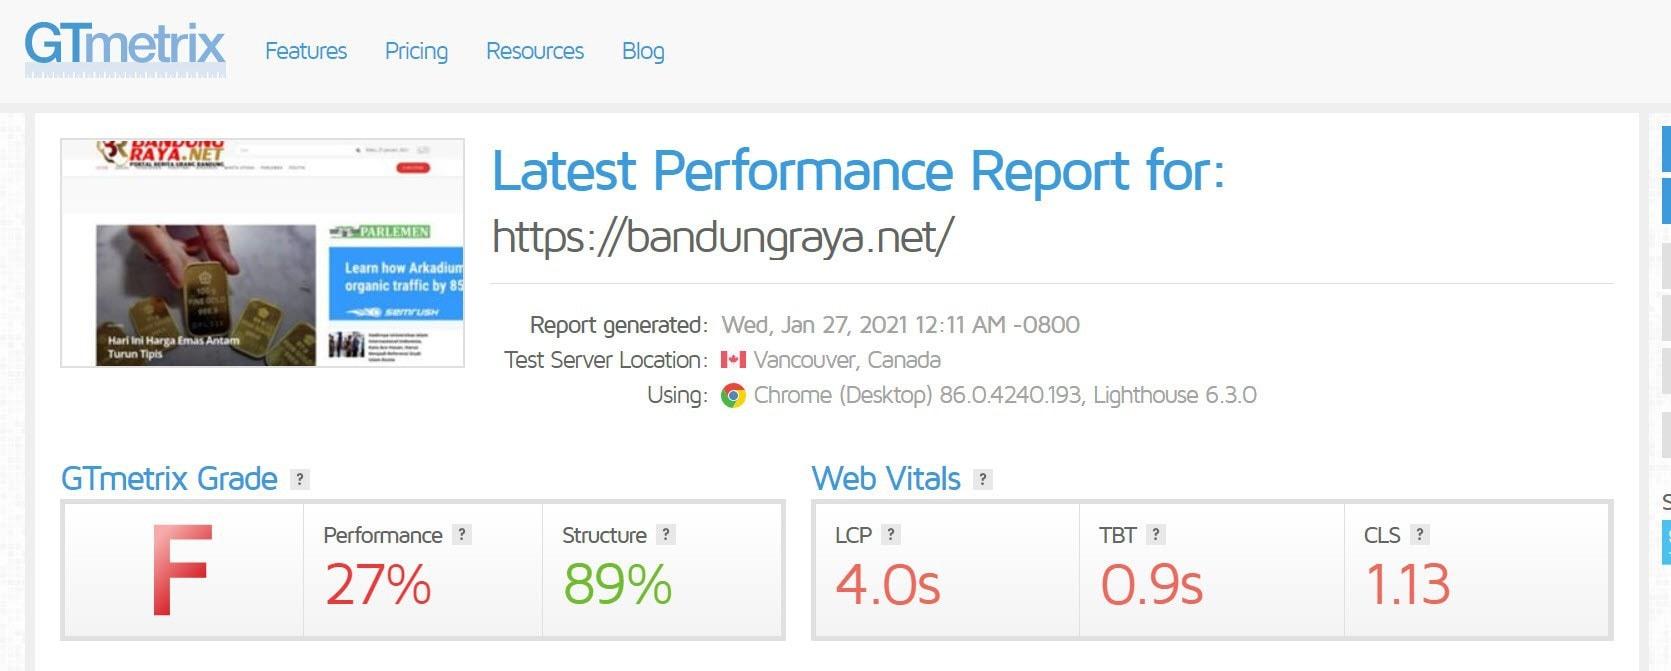 bandungraya.net GTmetrix score